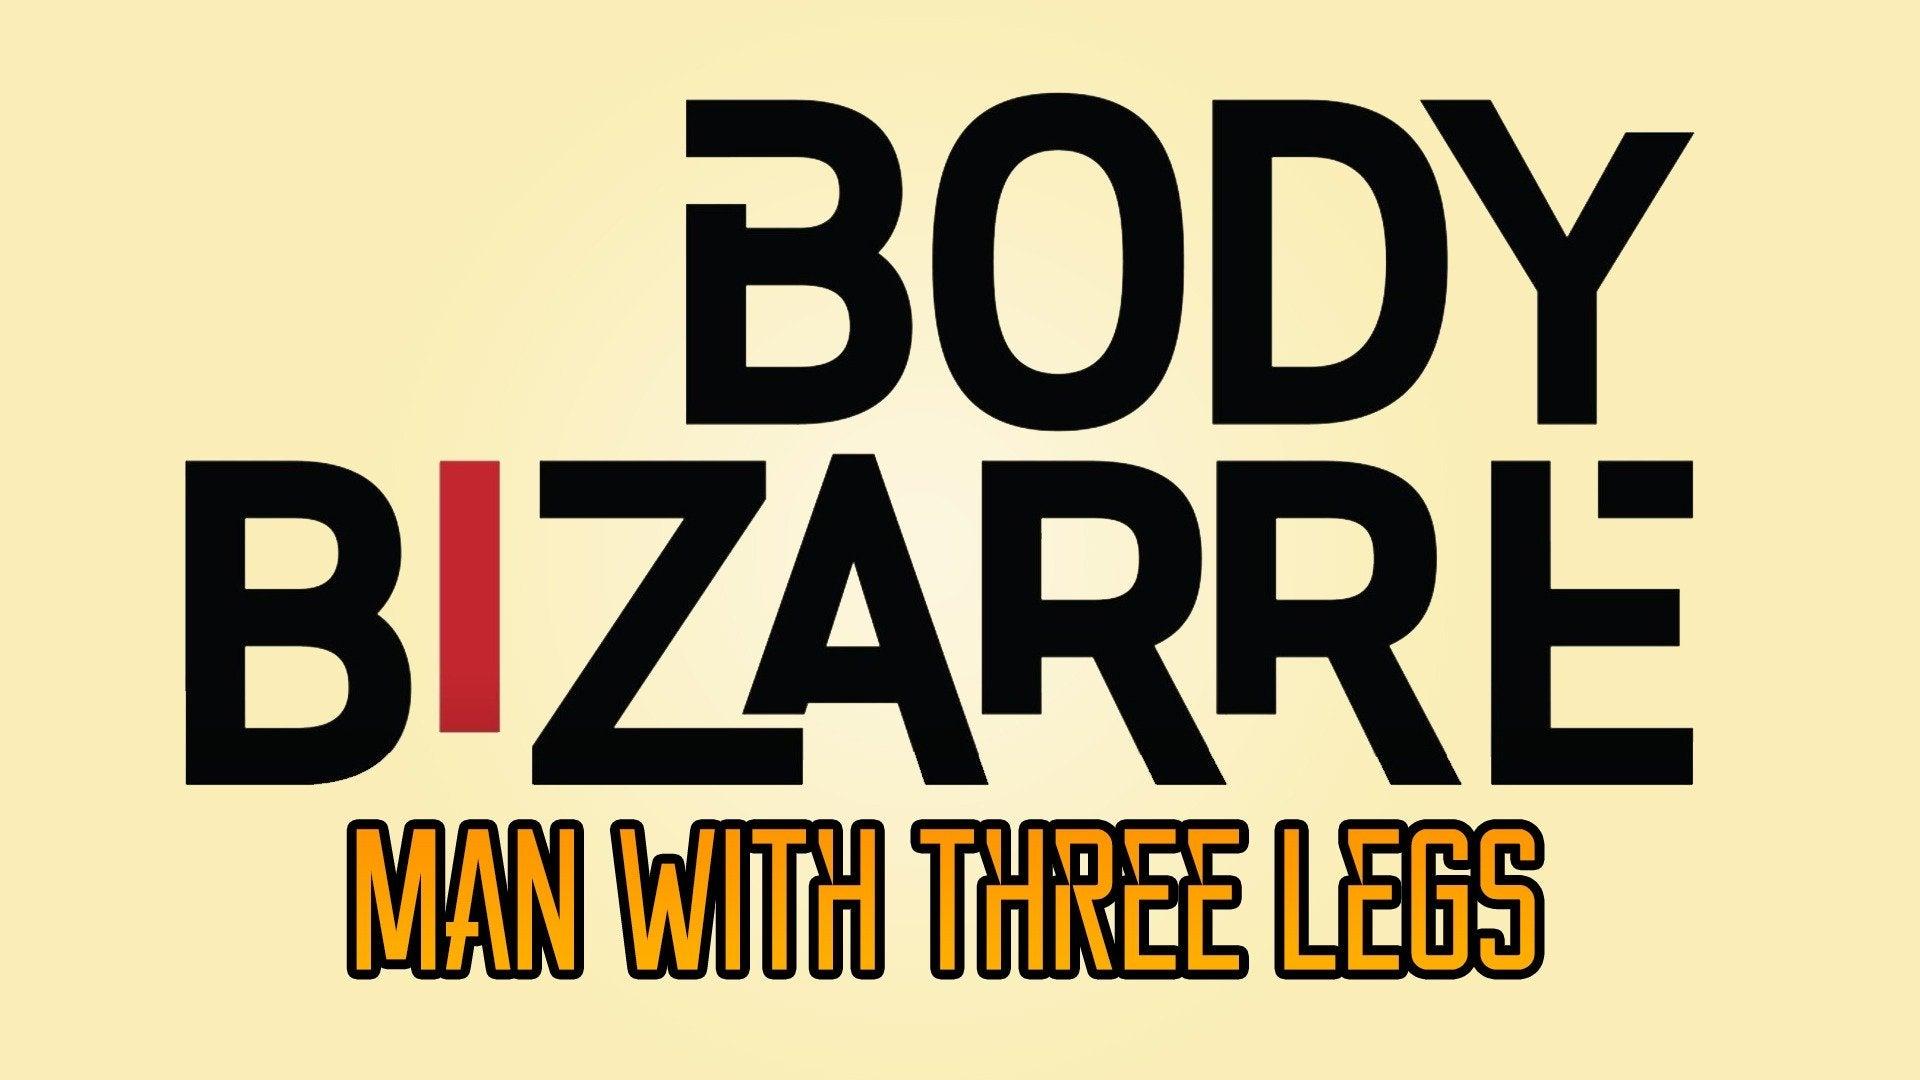 Man With Three Legs: Body Bizarre